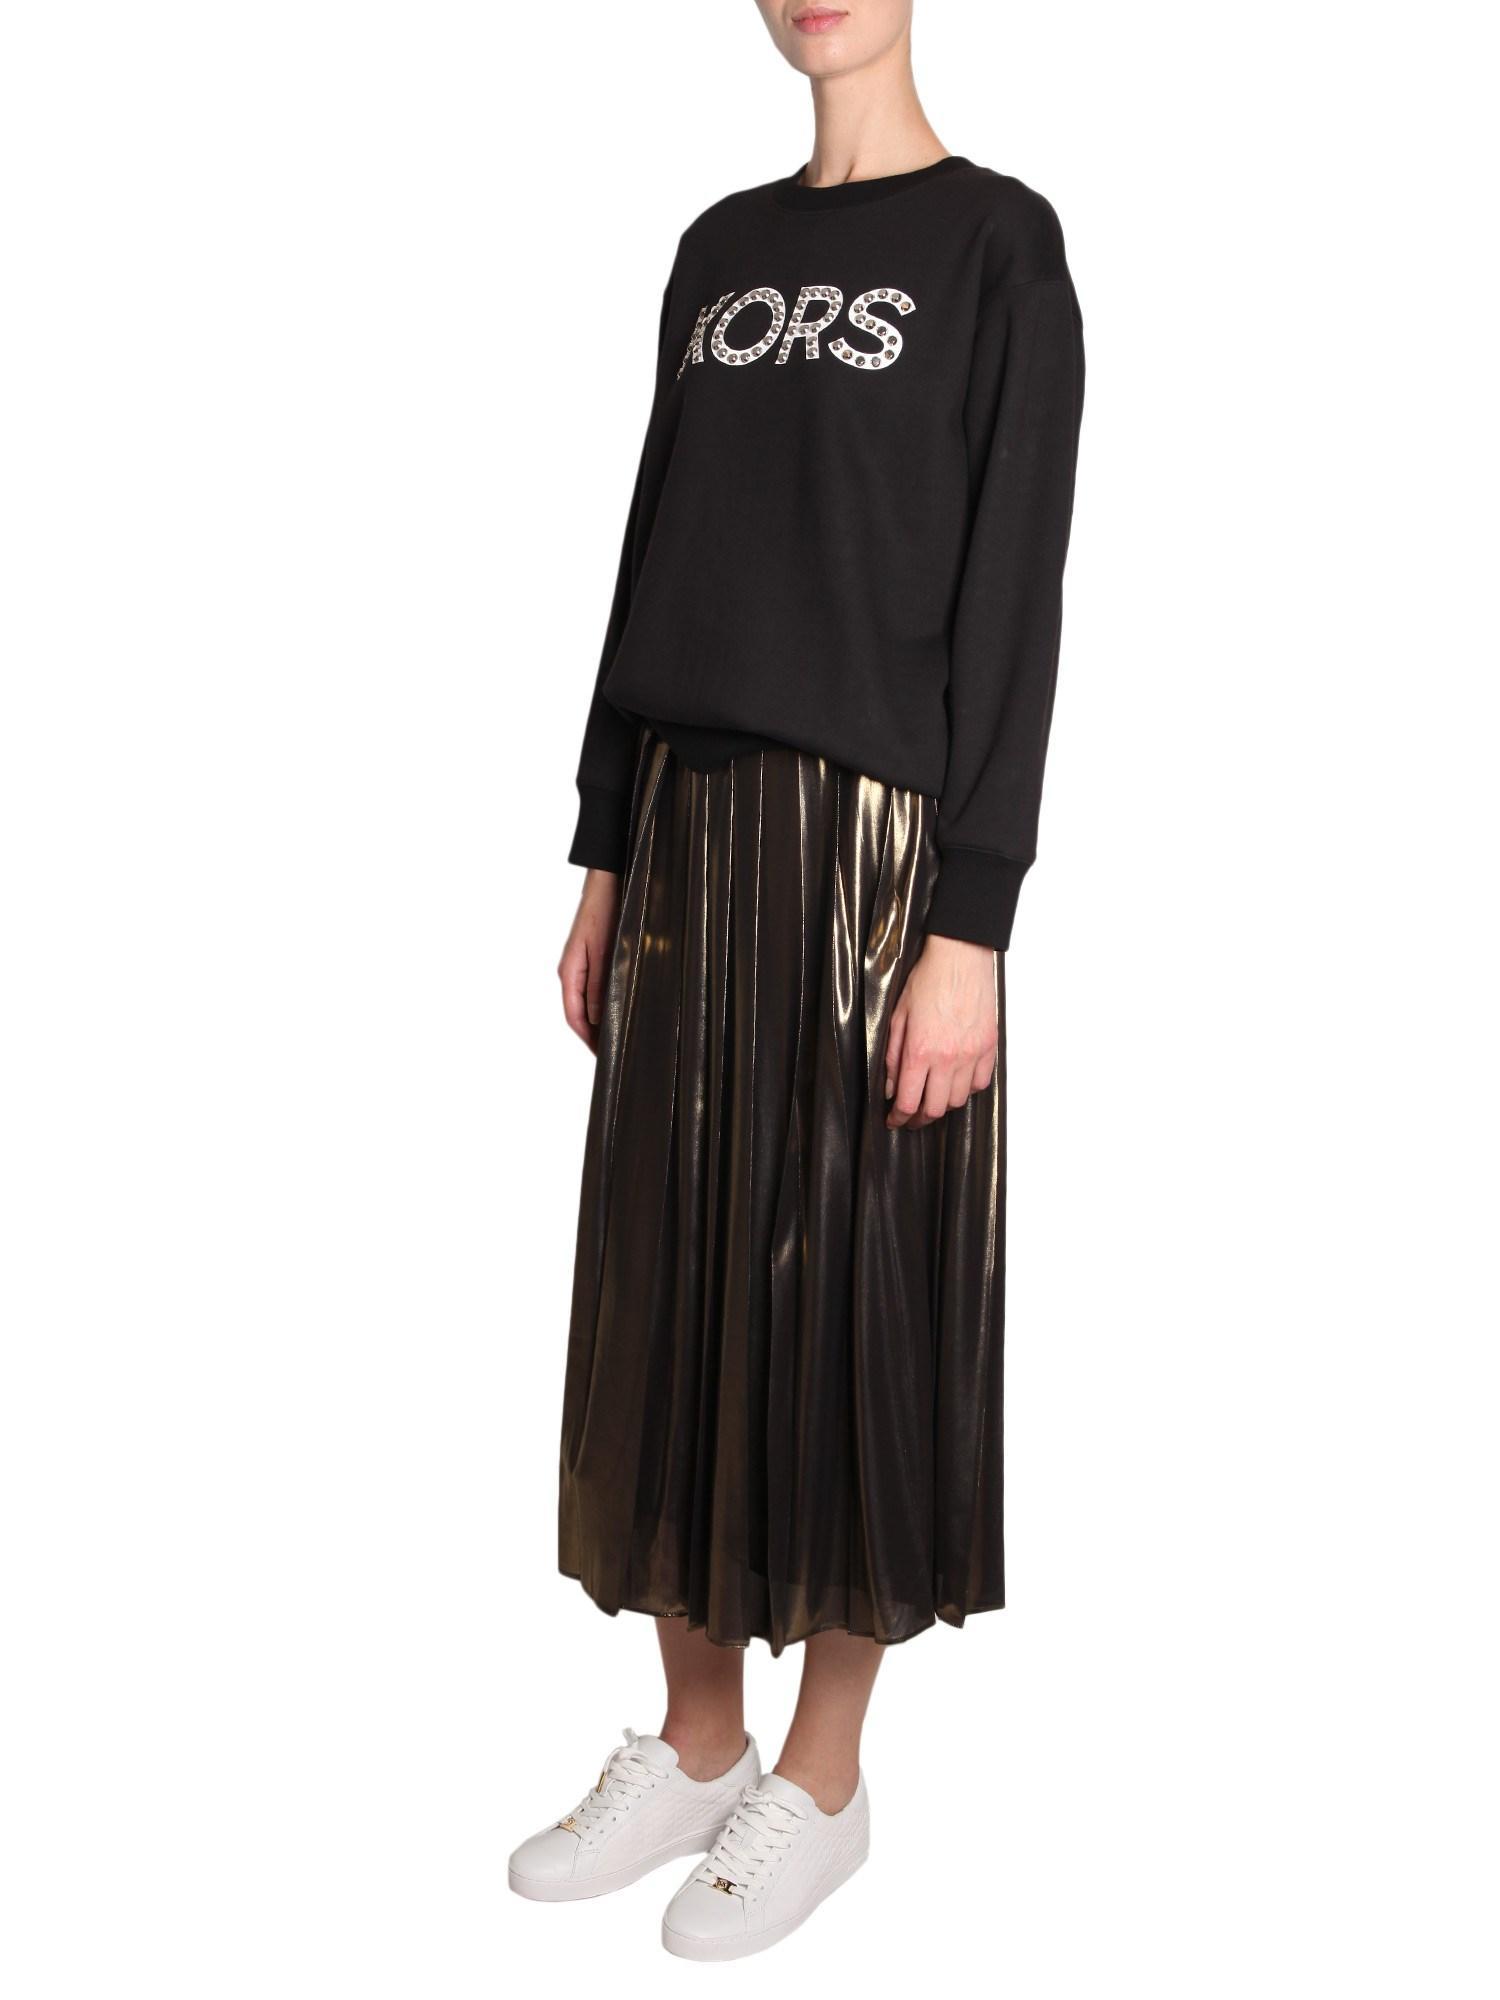 91a48e37686 MICHAEL Michael Kors. Women s Black Cotton Mixed Sweatshirt With Studded  Logo